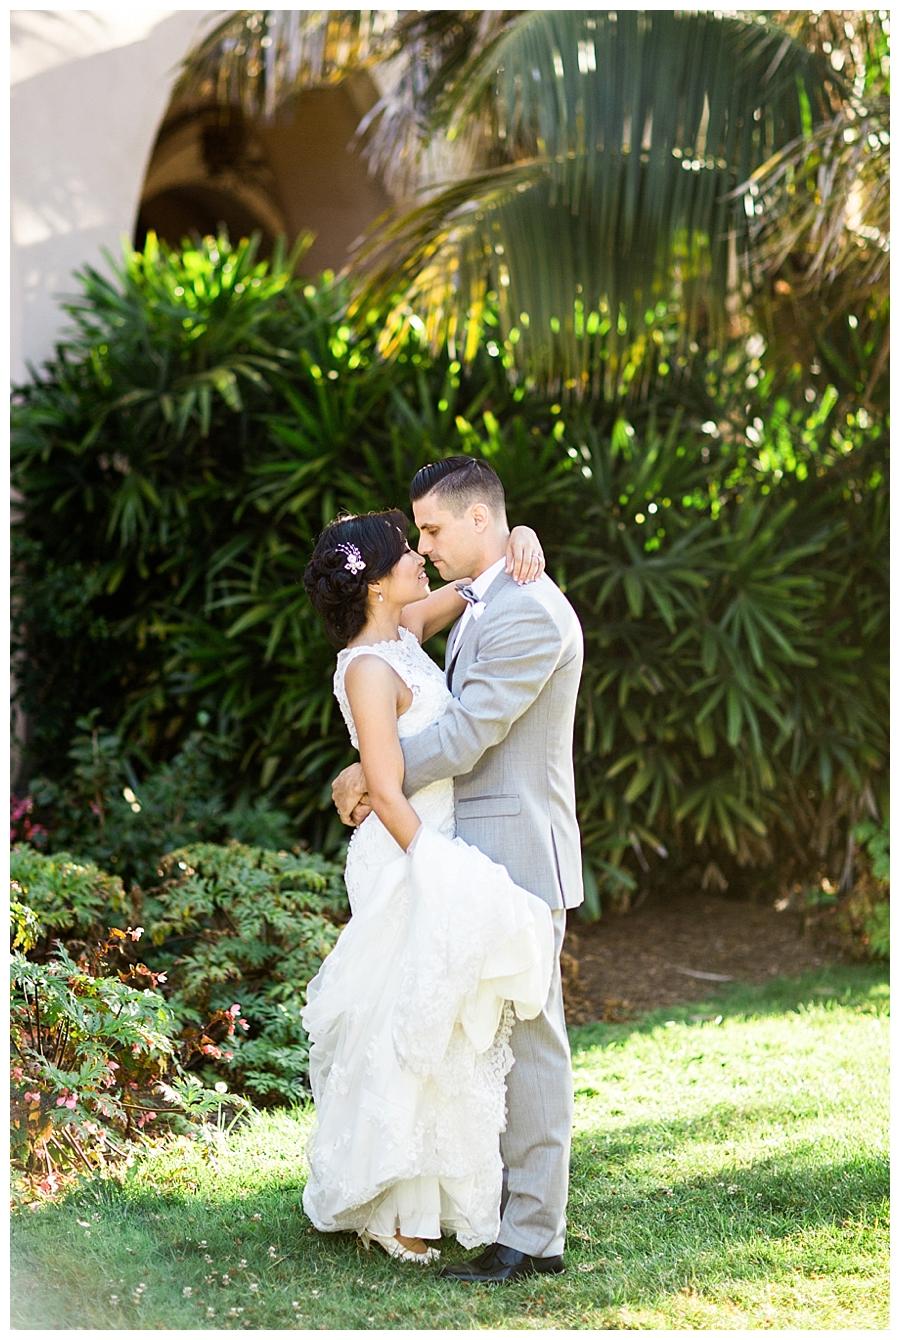 destination fine art wedding photography at Balboa Park in San Diego, California